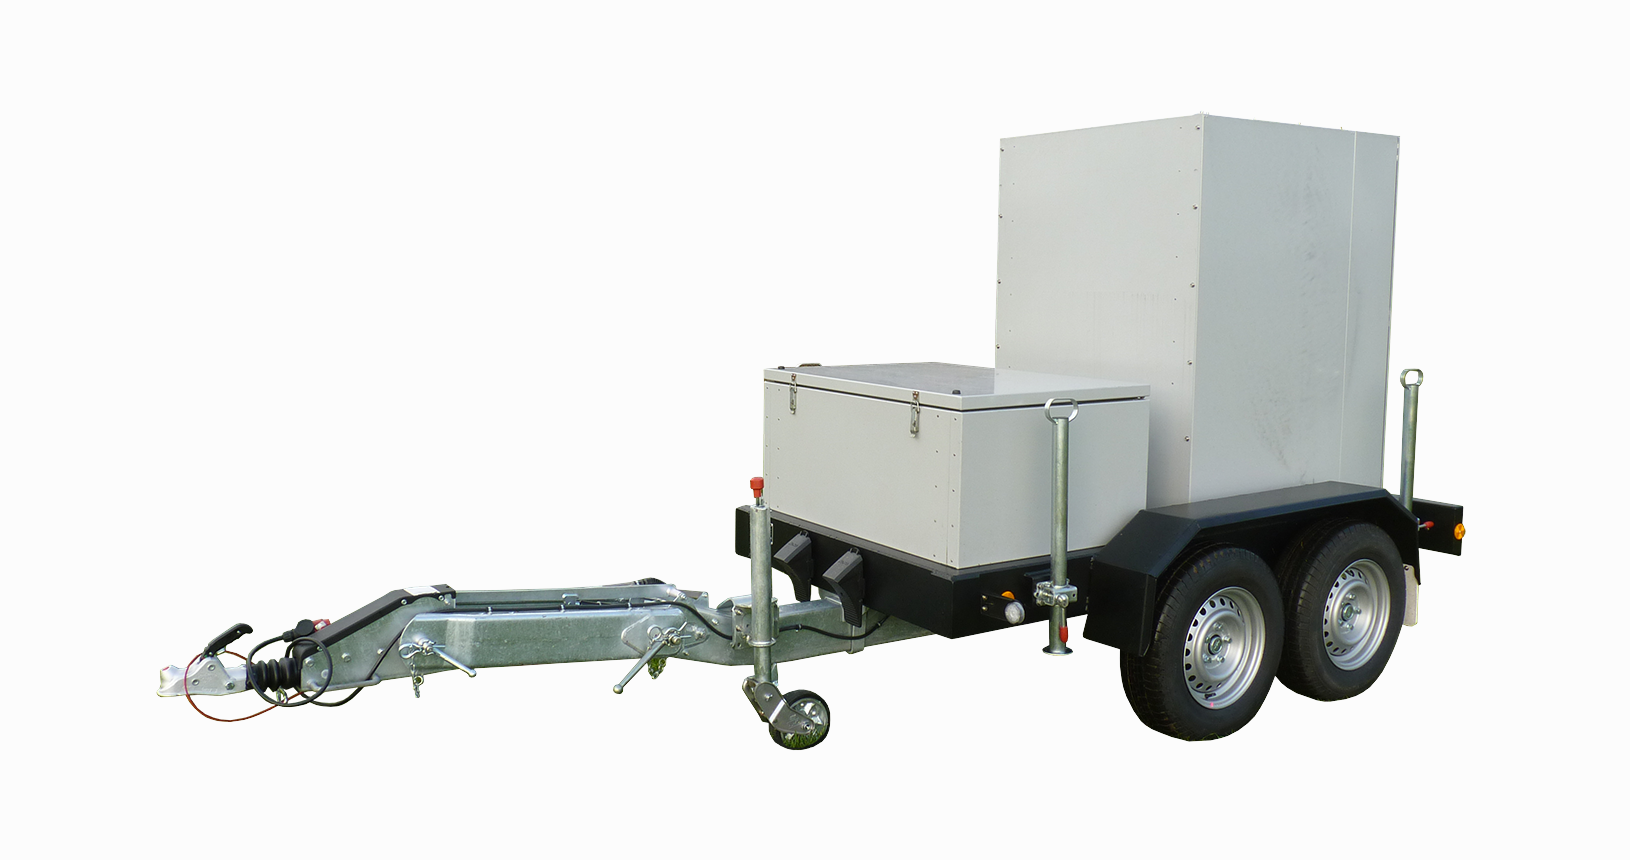 Gerätetransporter Lastwiderstand aufgebaut